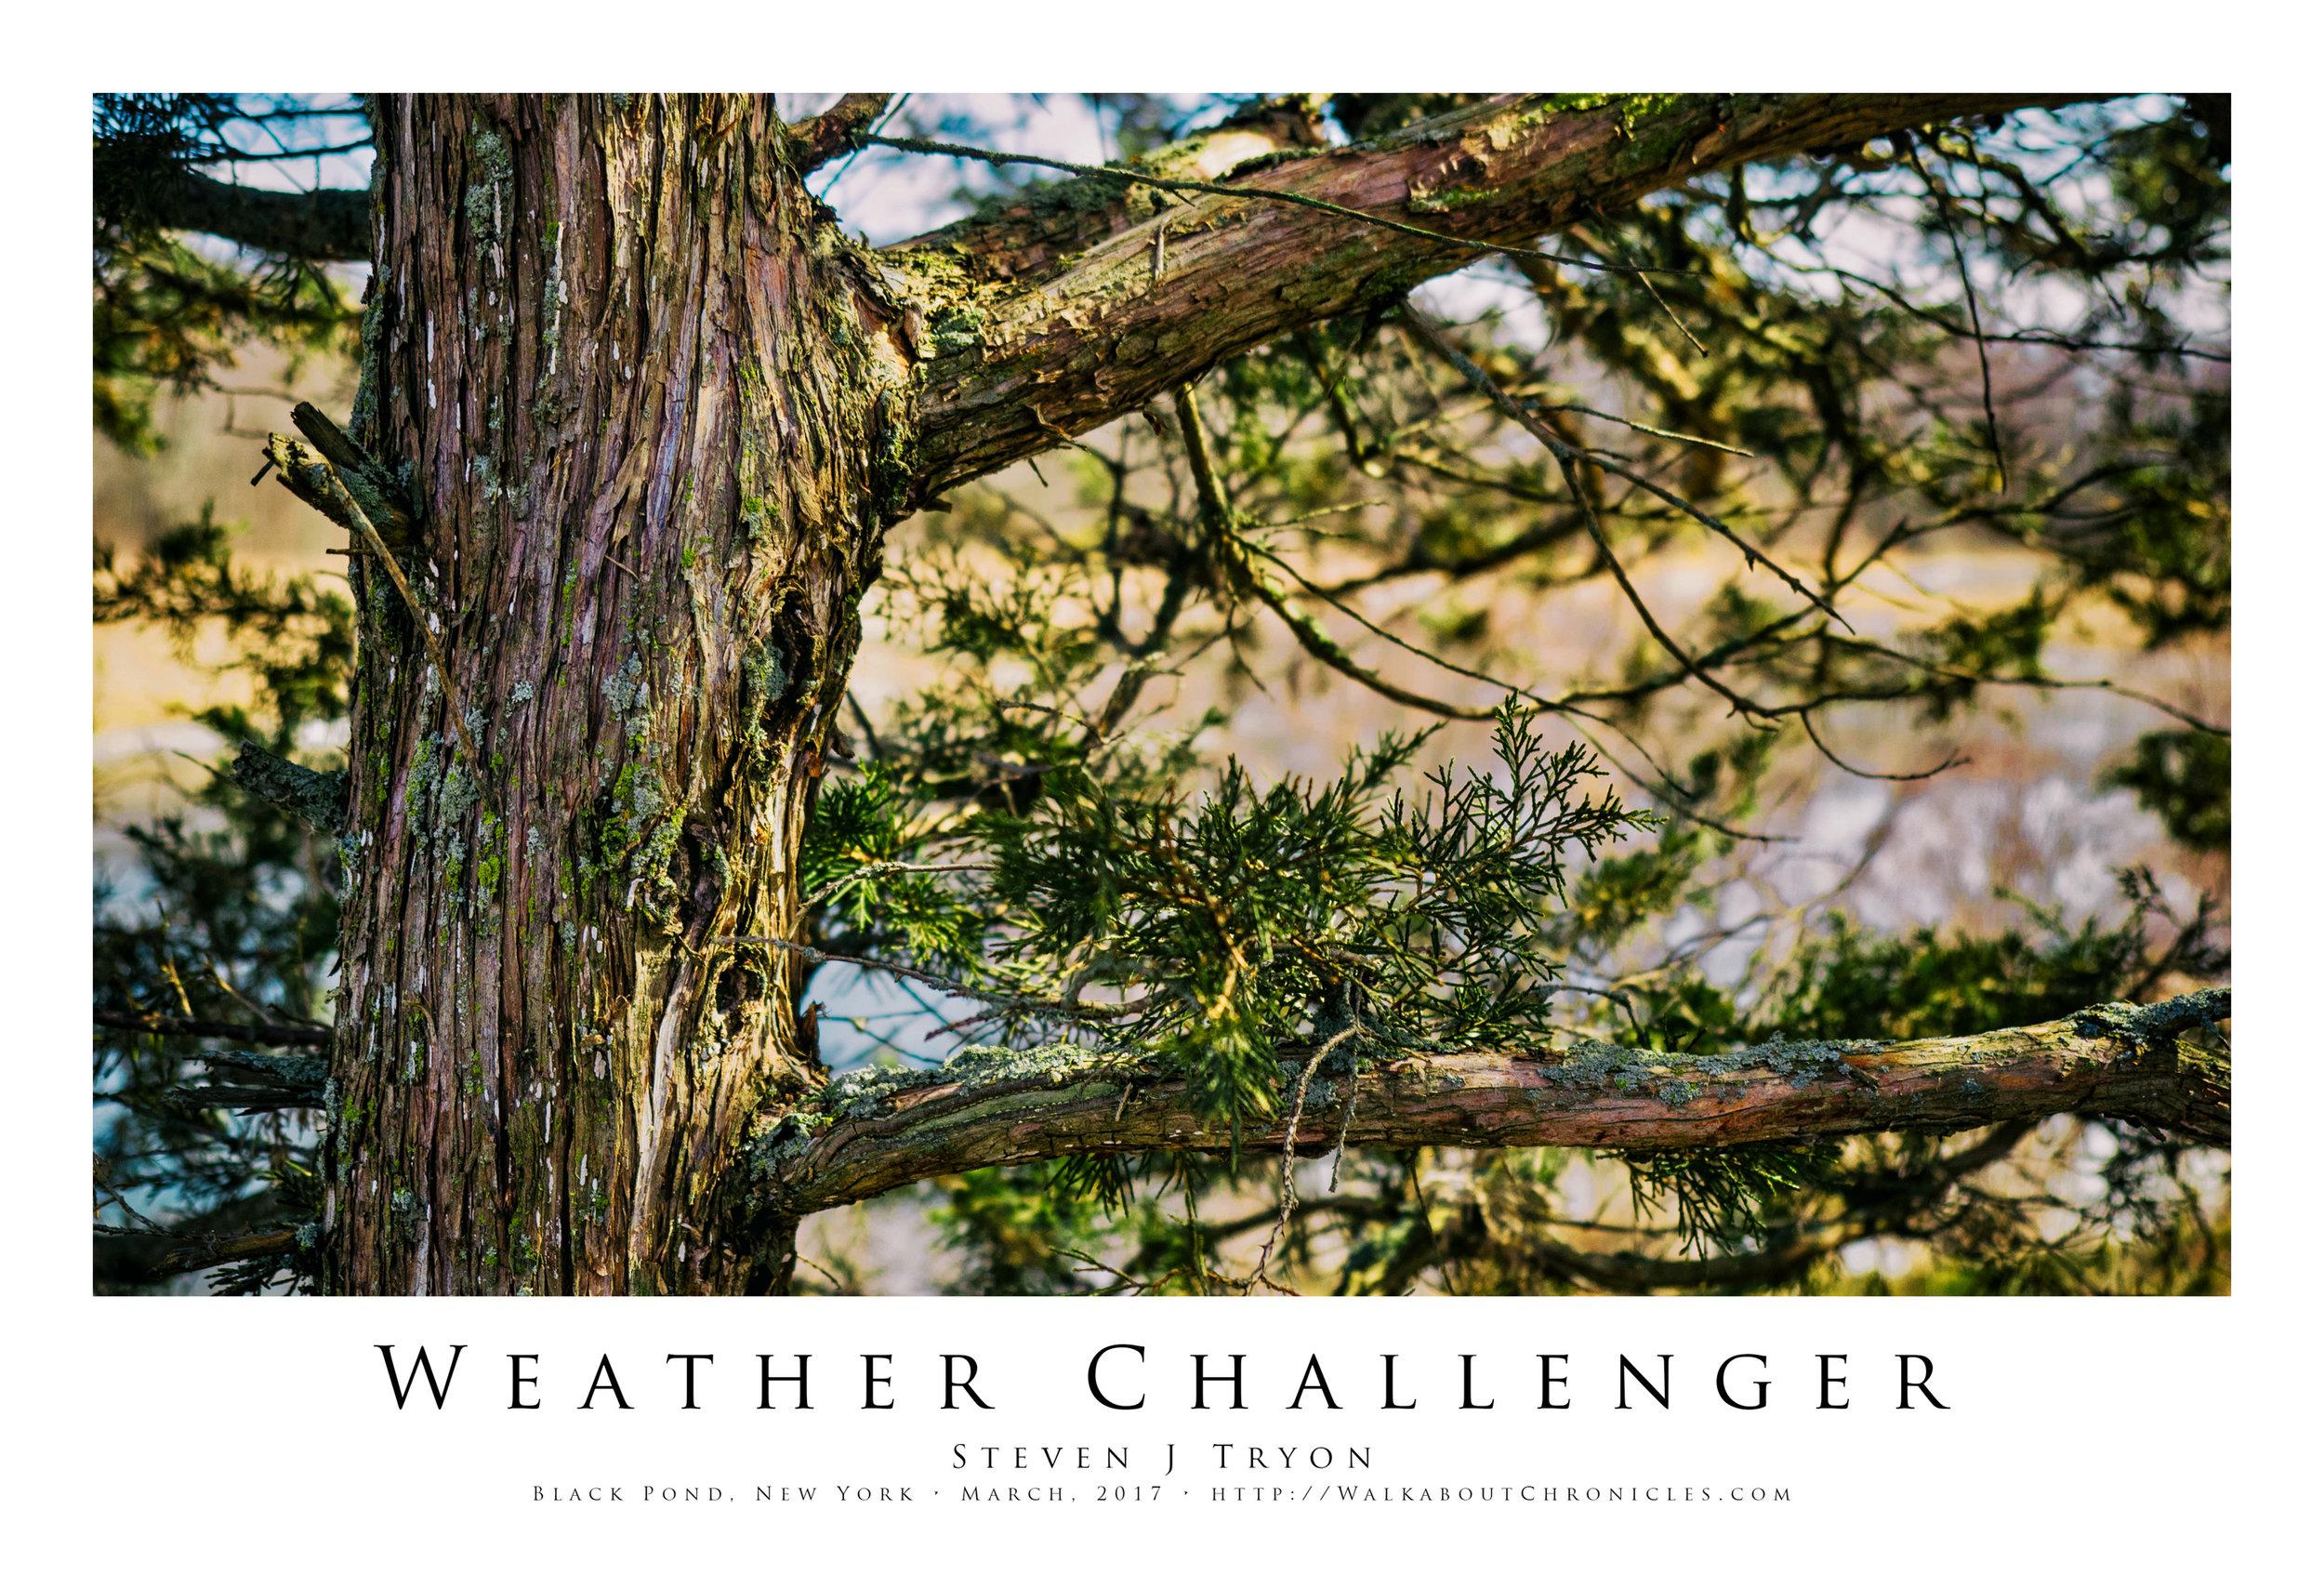 Weather Challenger